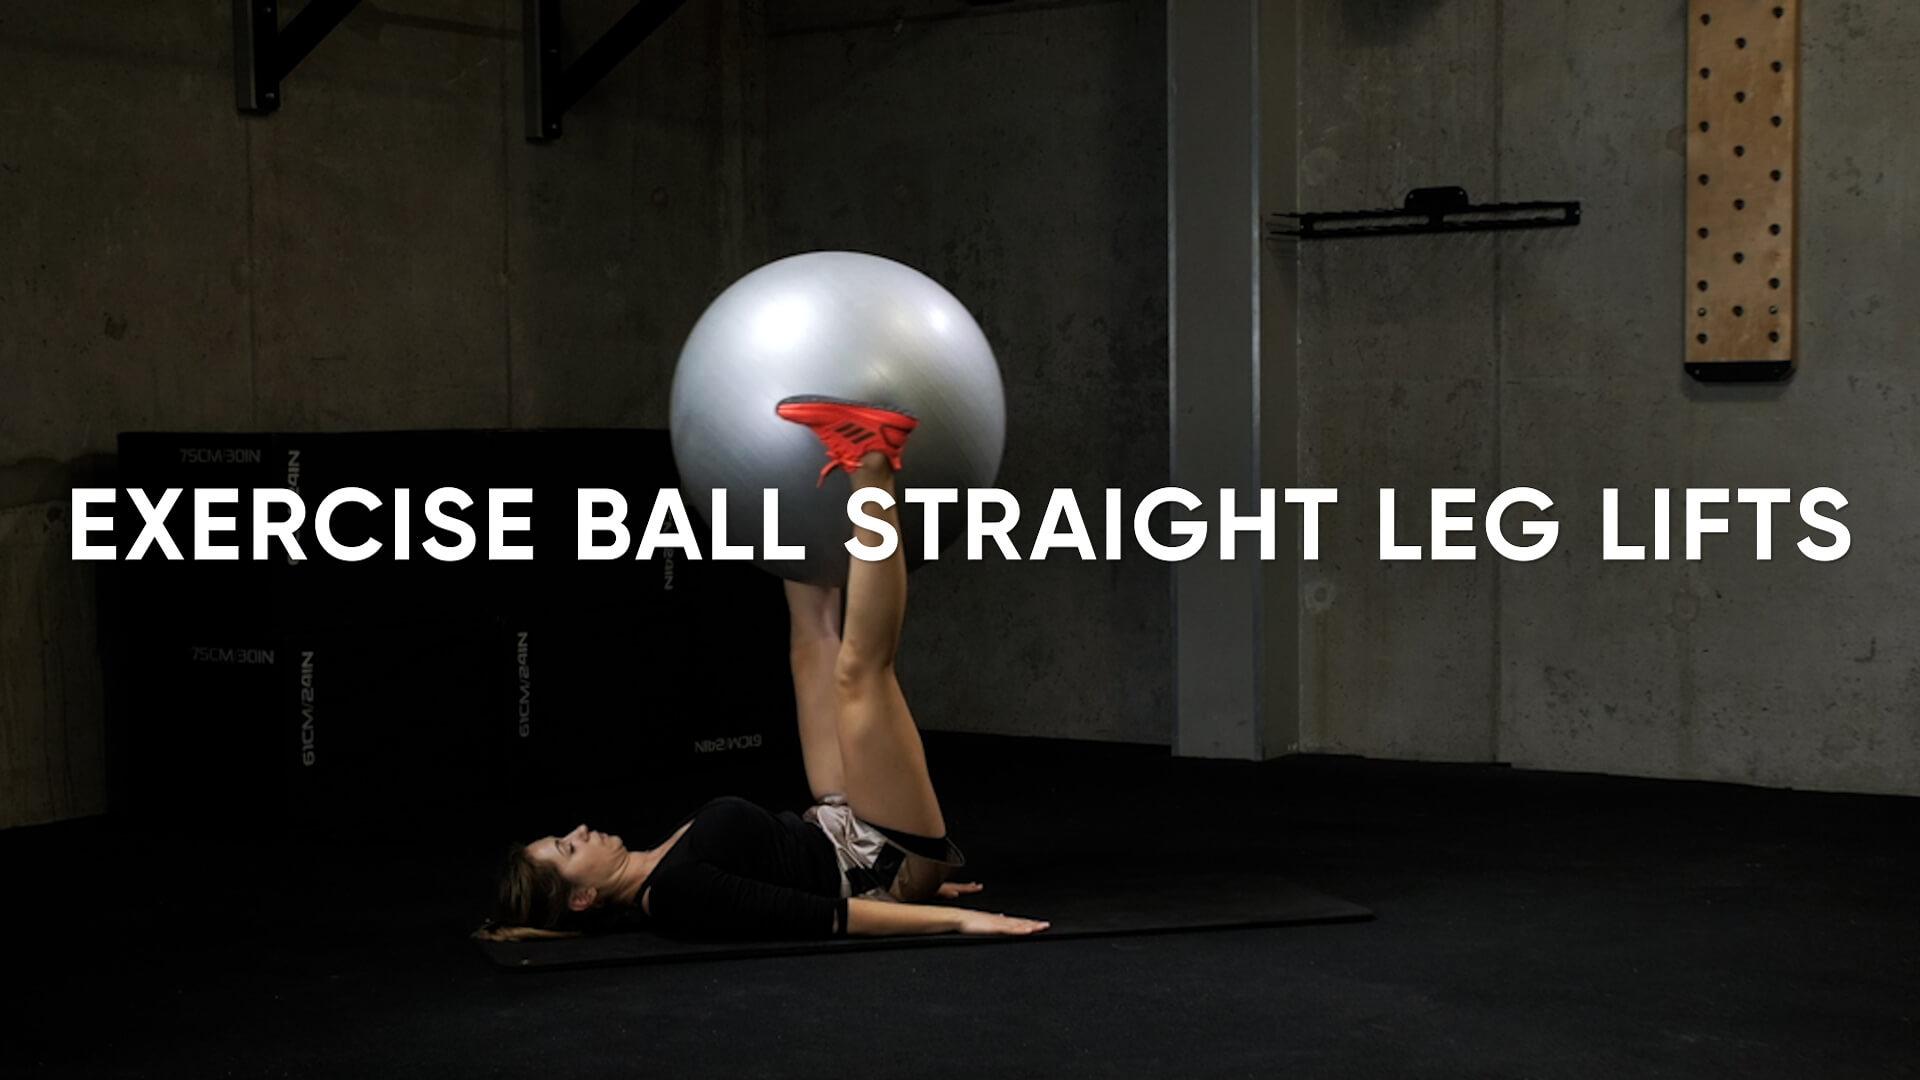 Exercise Ball Straight Leg Lifts